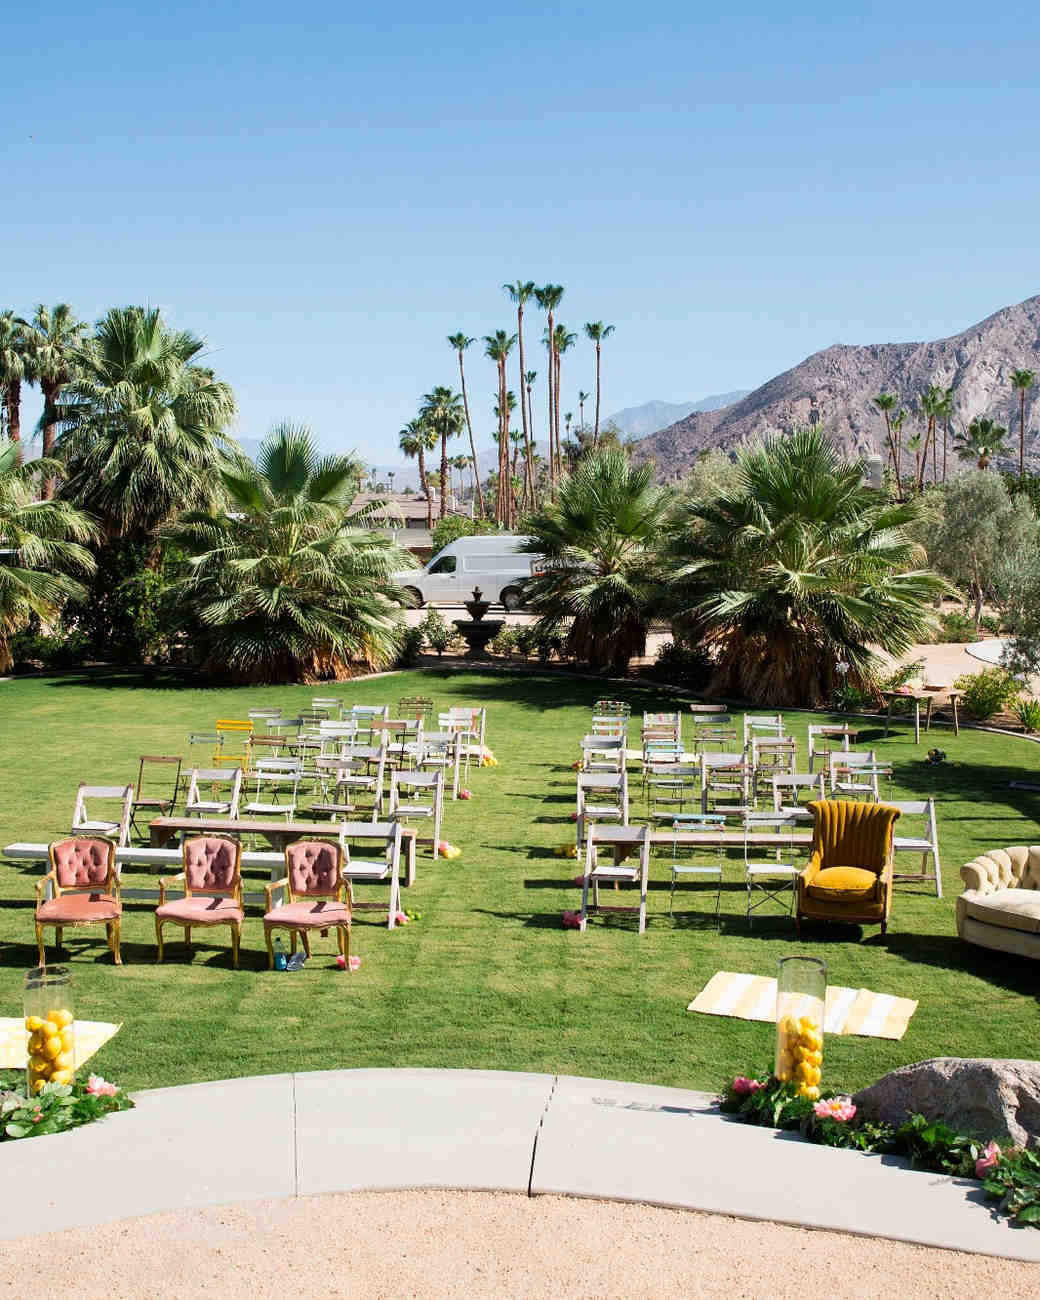 jess-levin-wedding-venue-tips-3-0316.jpg